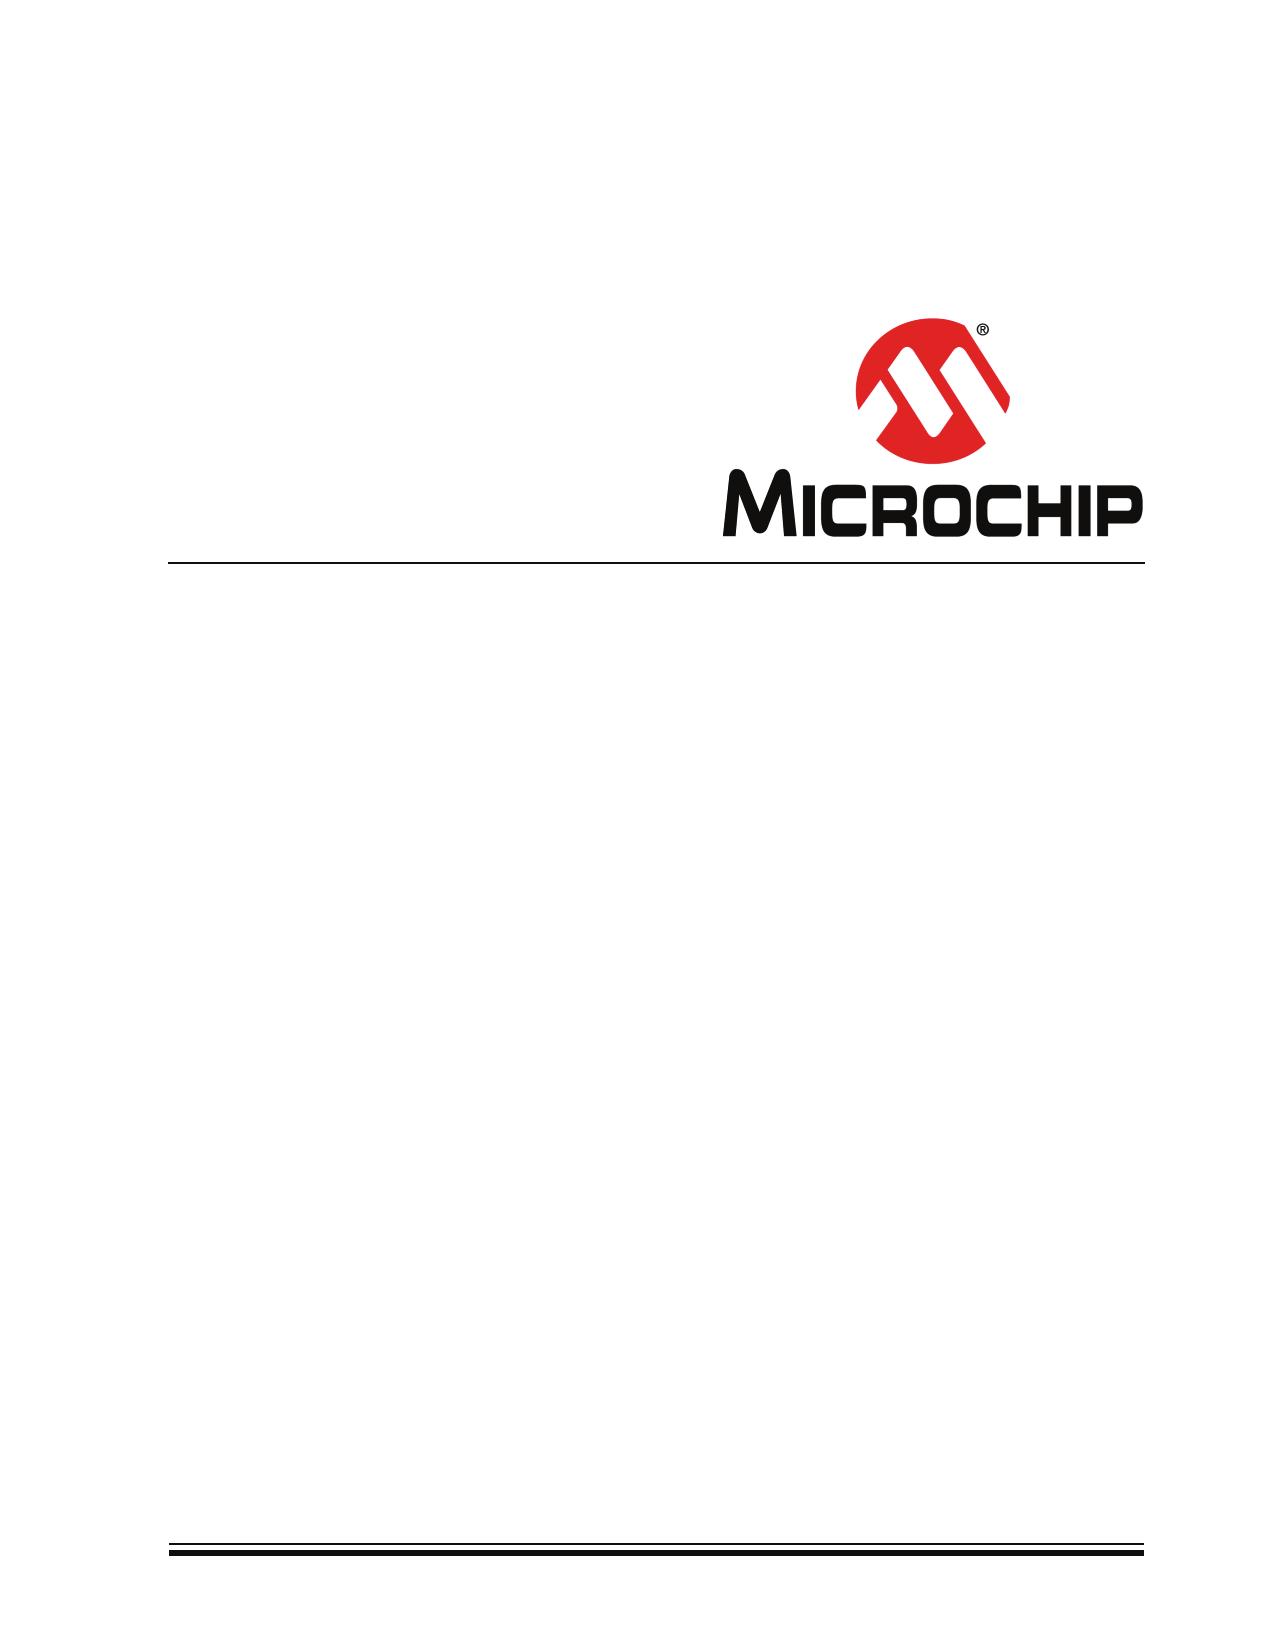 PIC12F752 데이터시트 및 PIC12F752 PDF